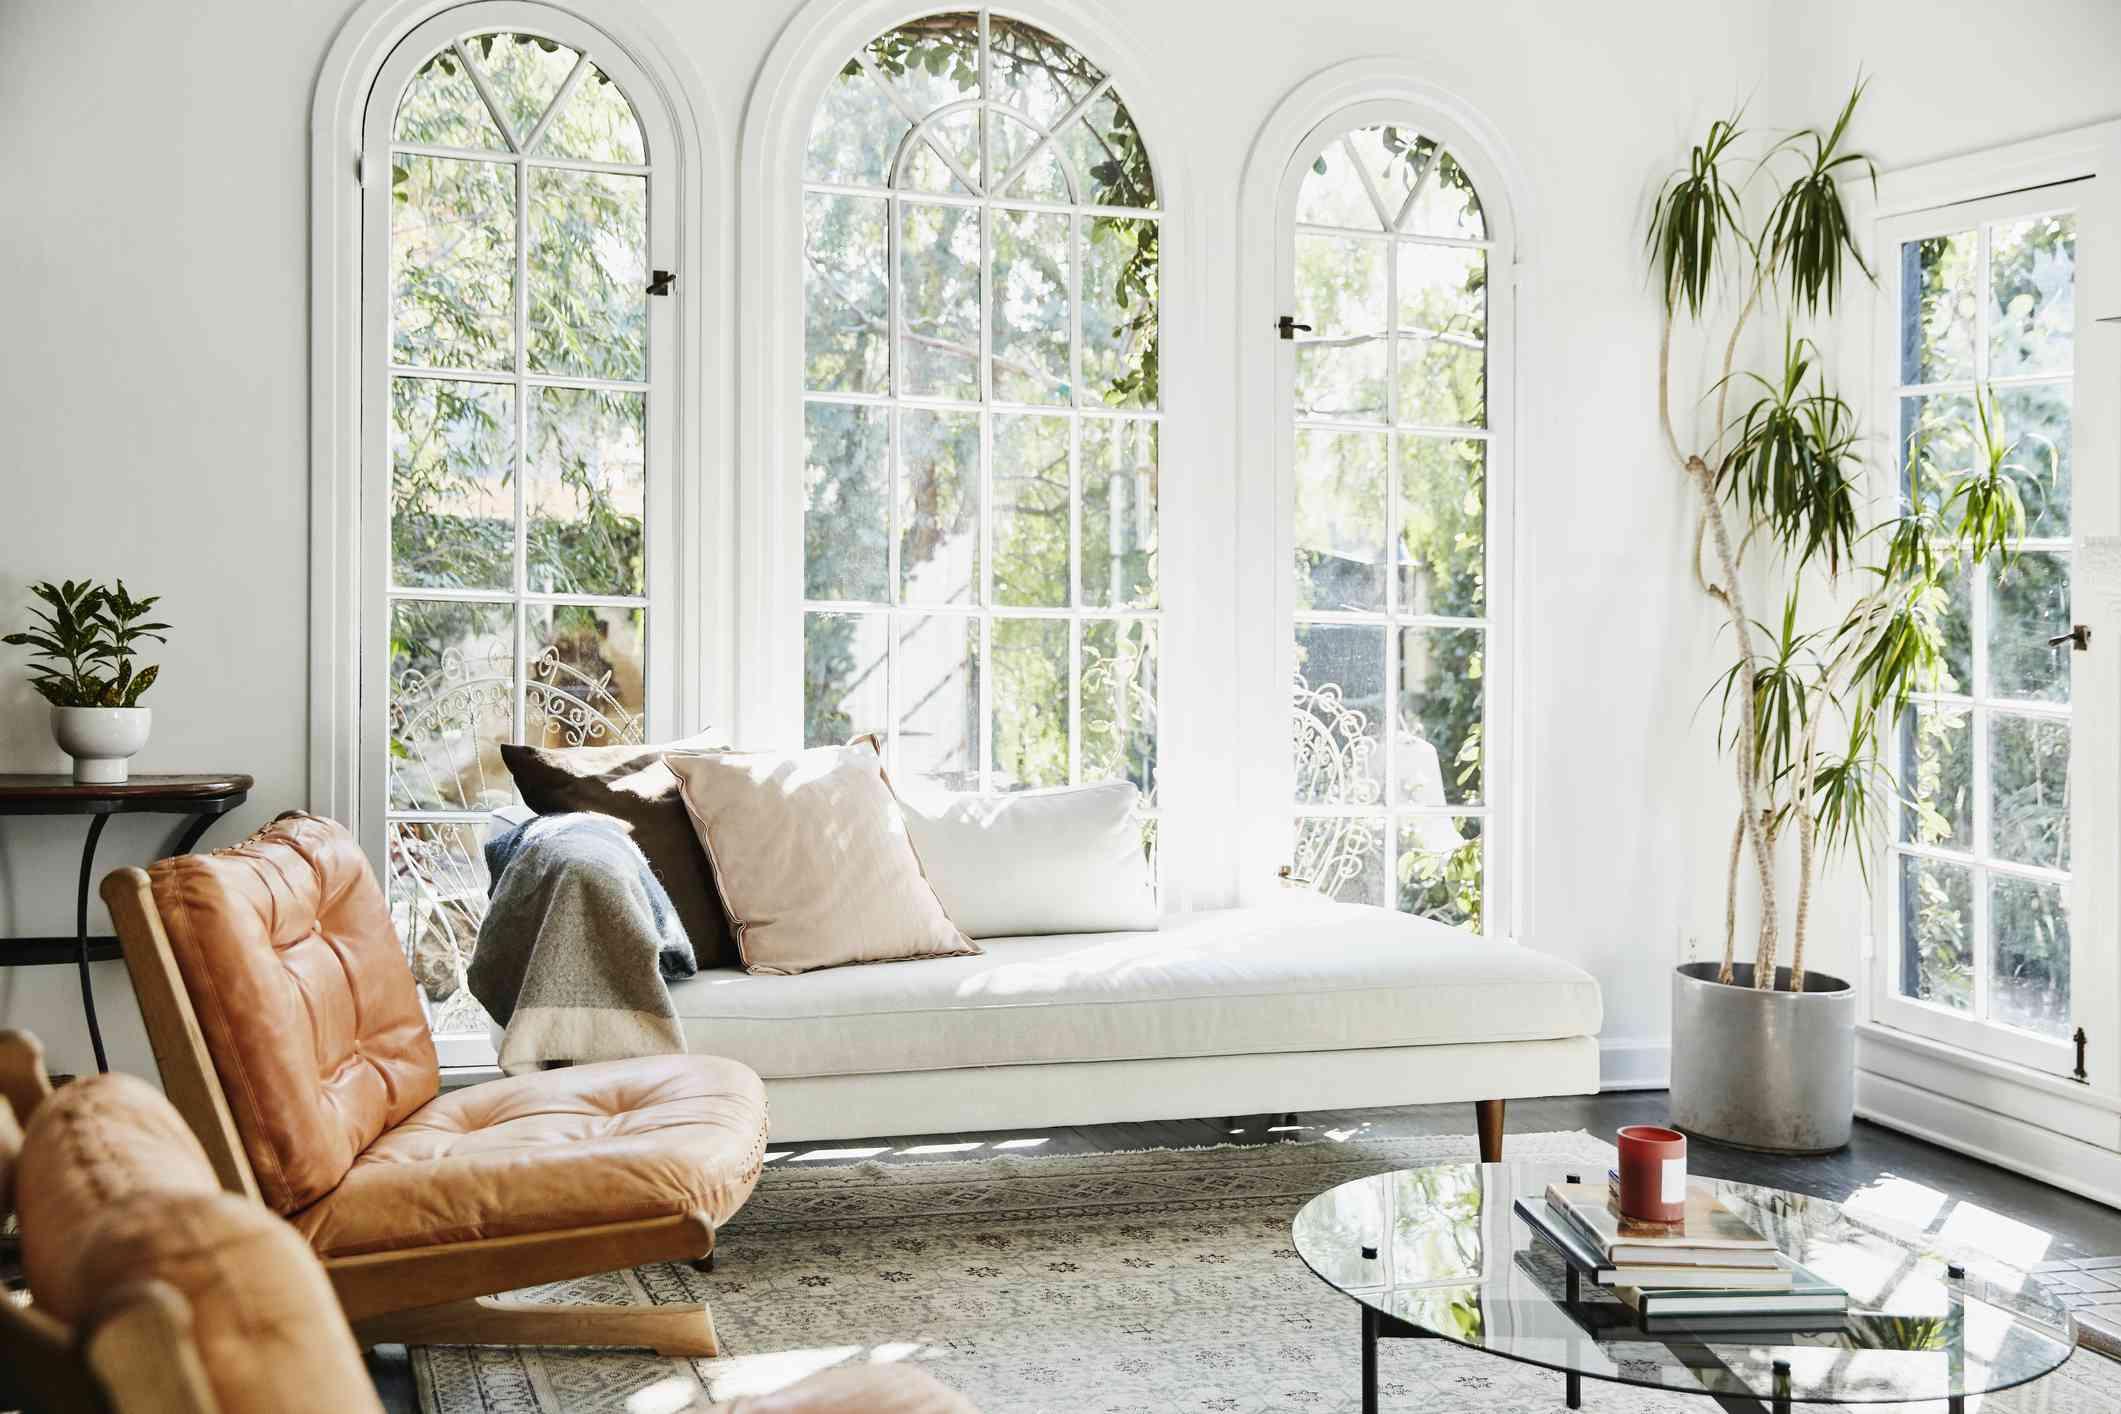 A crisp, white room with big windows.